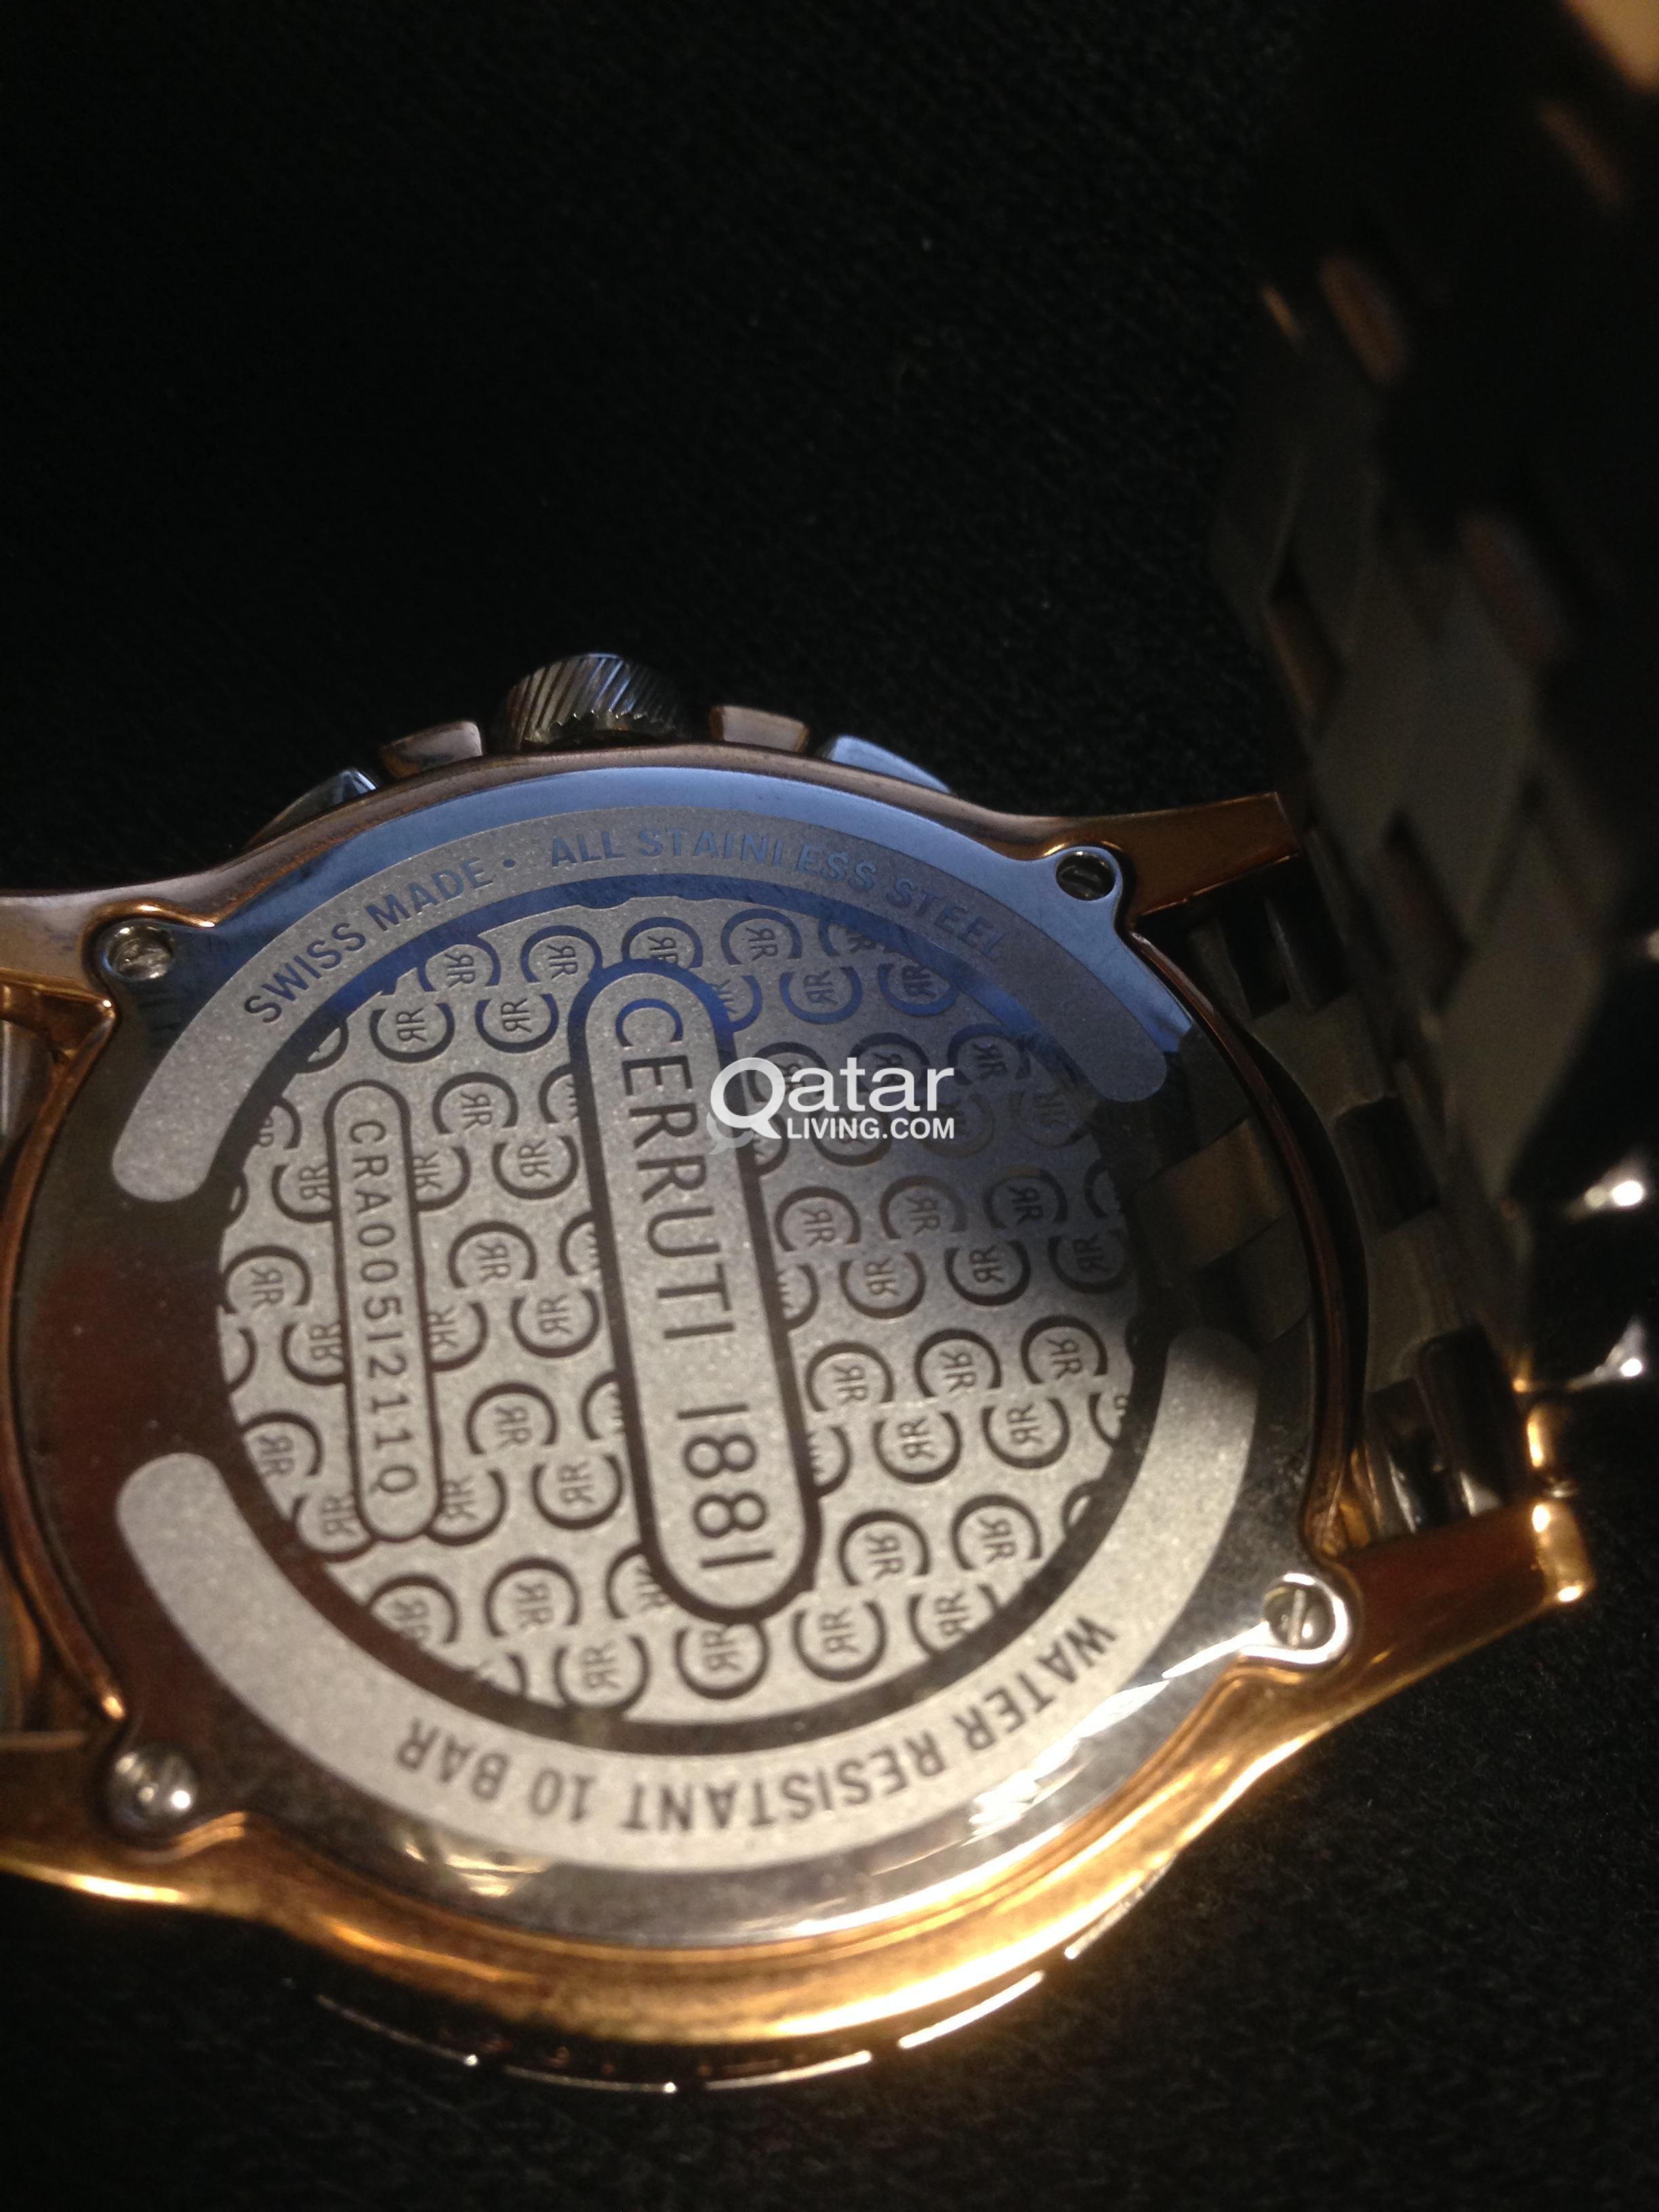 0ac48dab58 CERRUTI 1881 Diamond Watch for sale (Swiss made). | Qatar Living